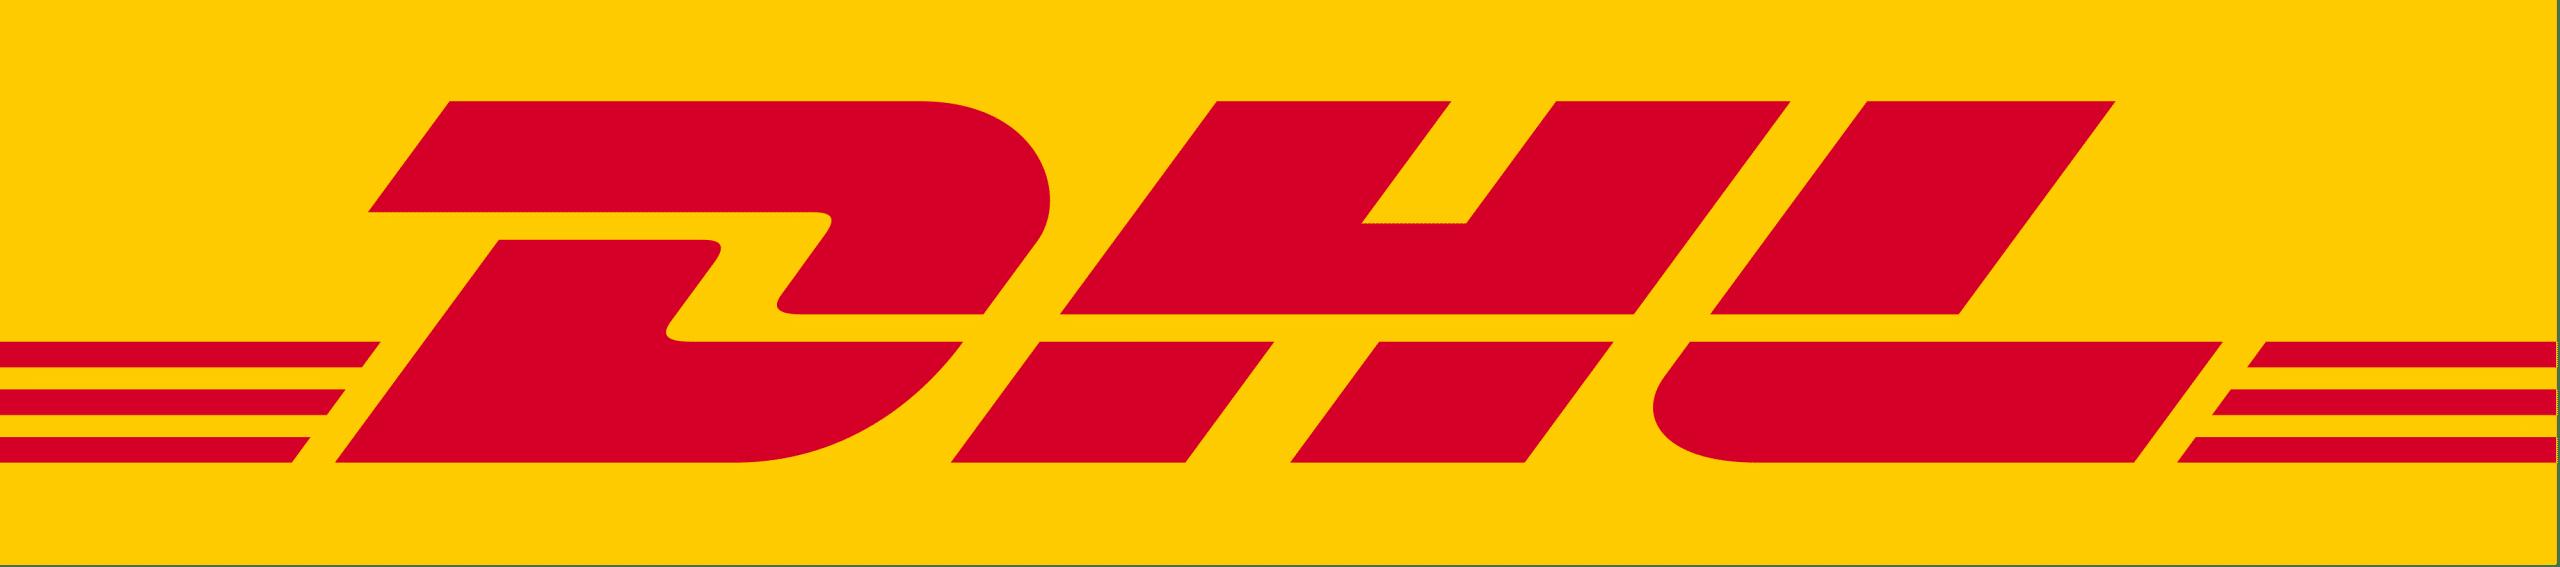 DHL Rastreamento